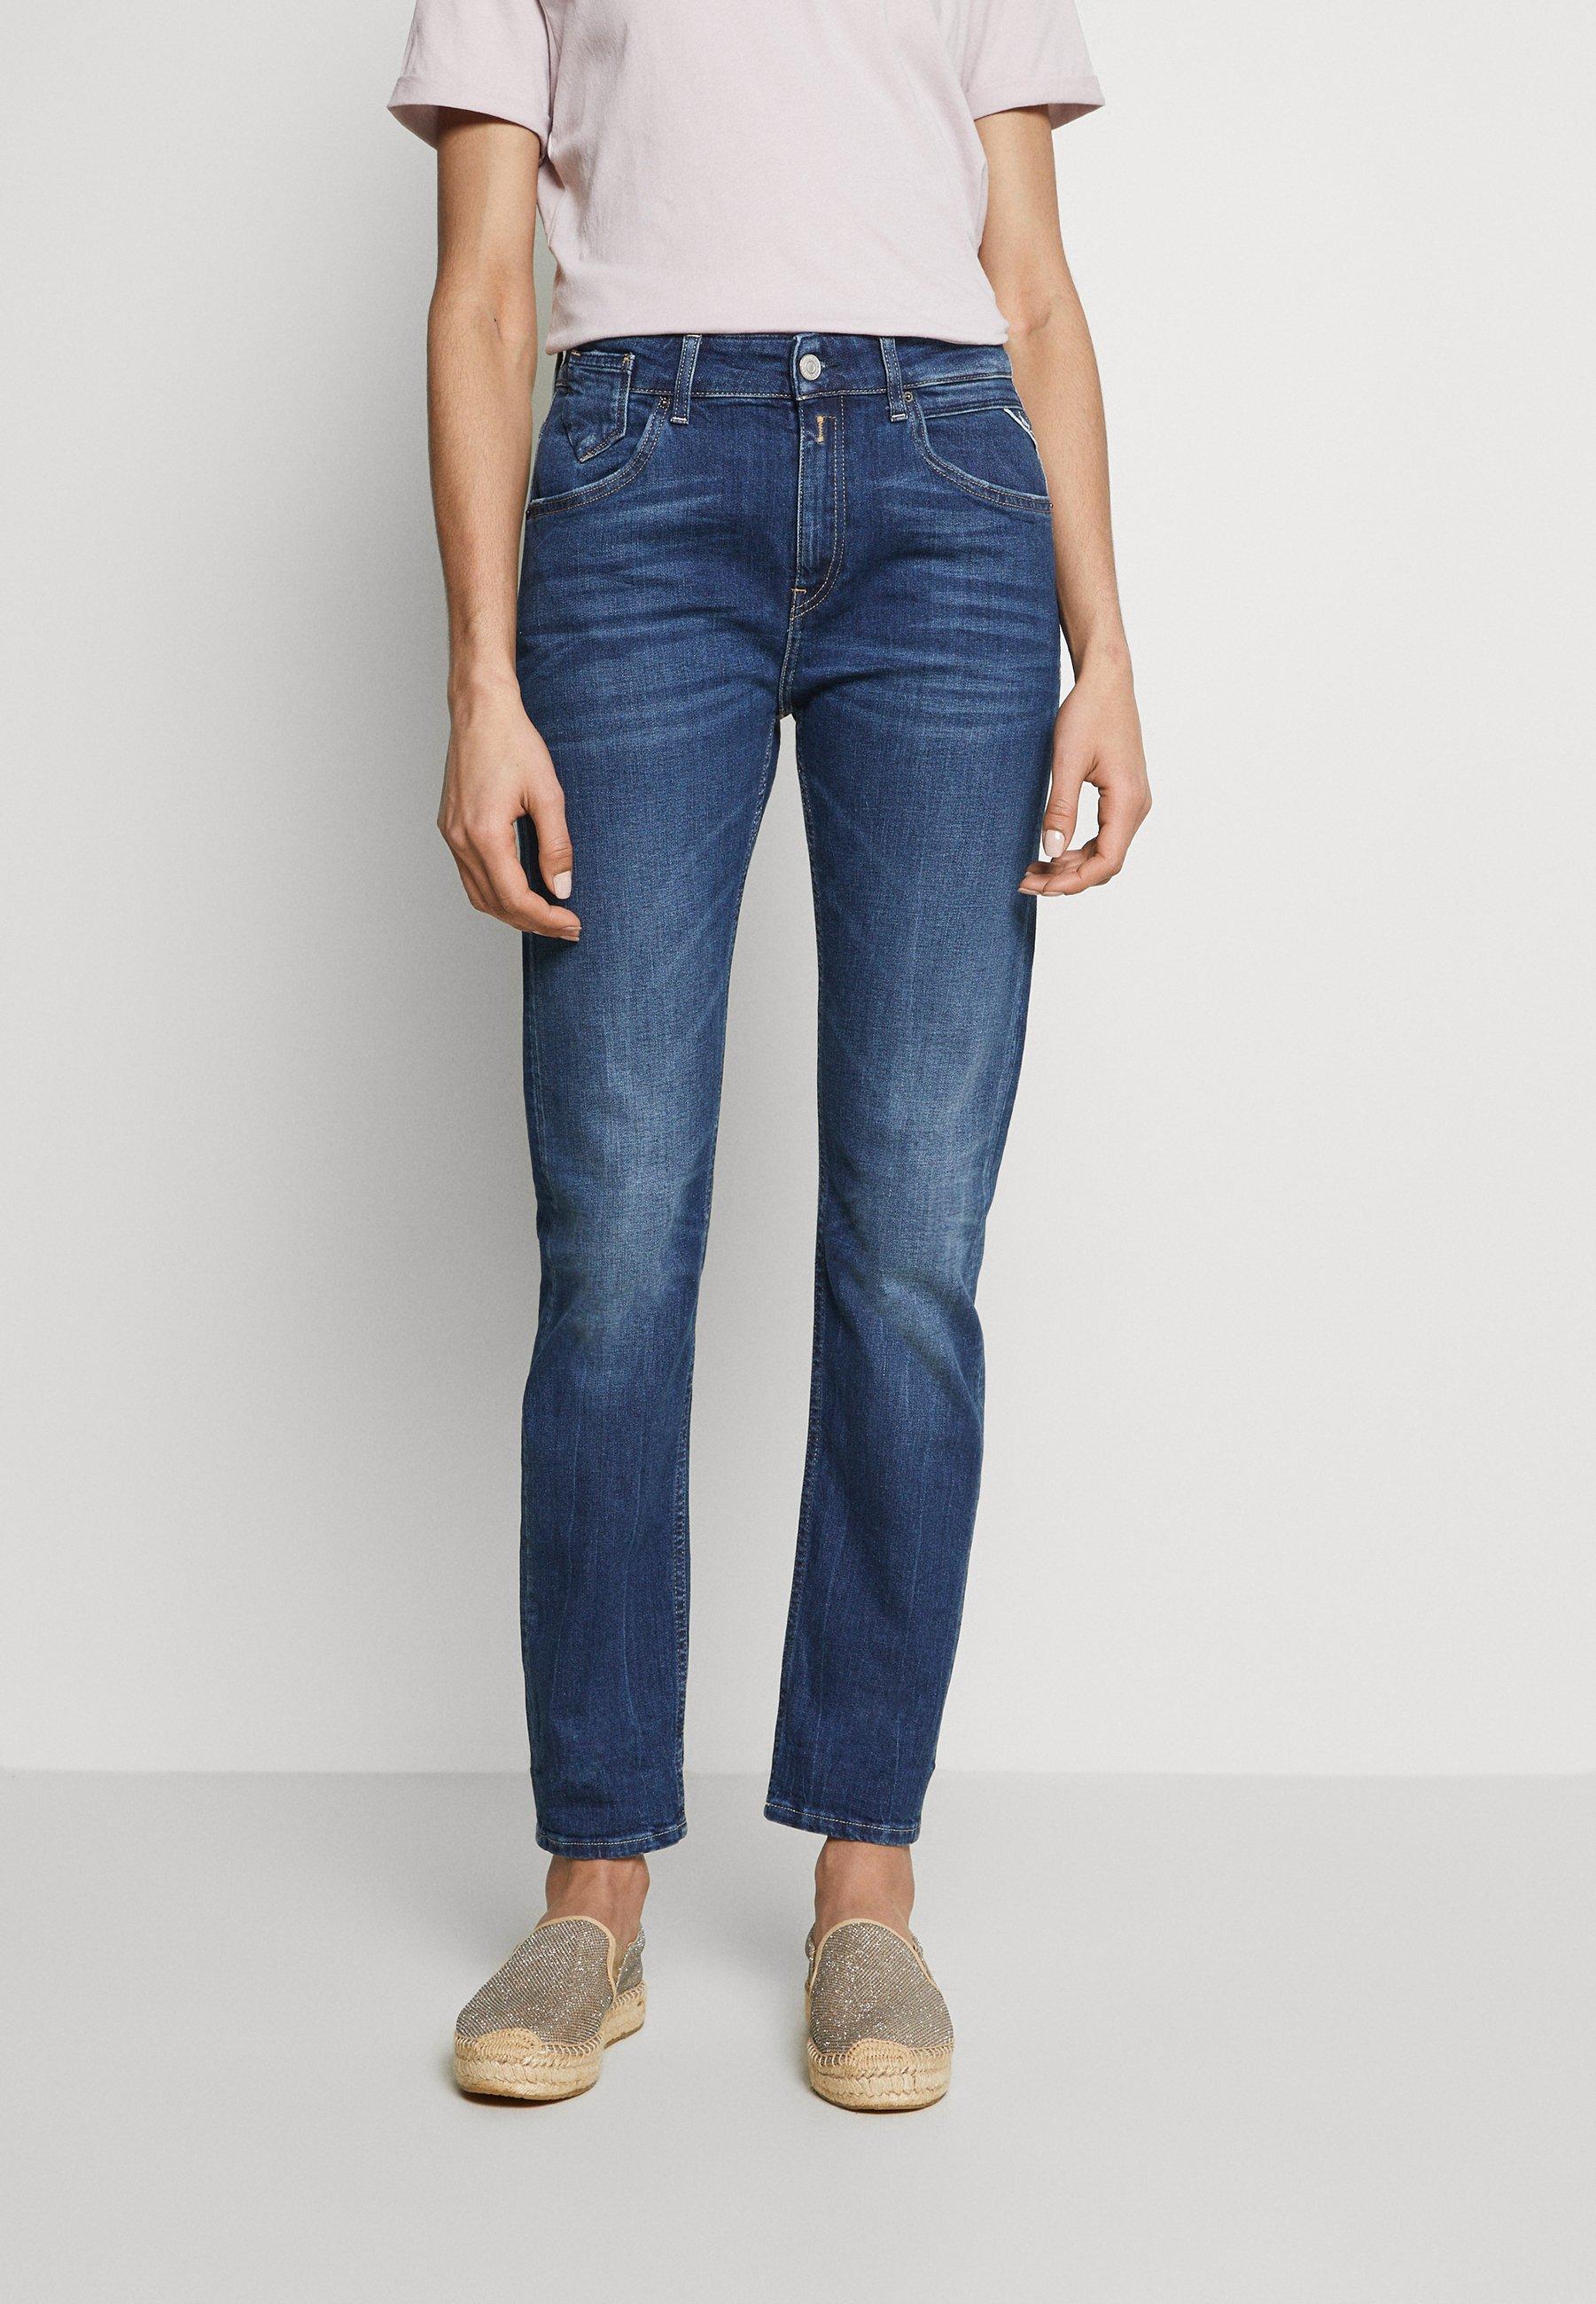 Femme MARTY PANTS - Jean slim